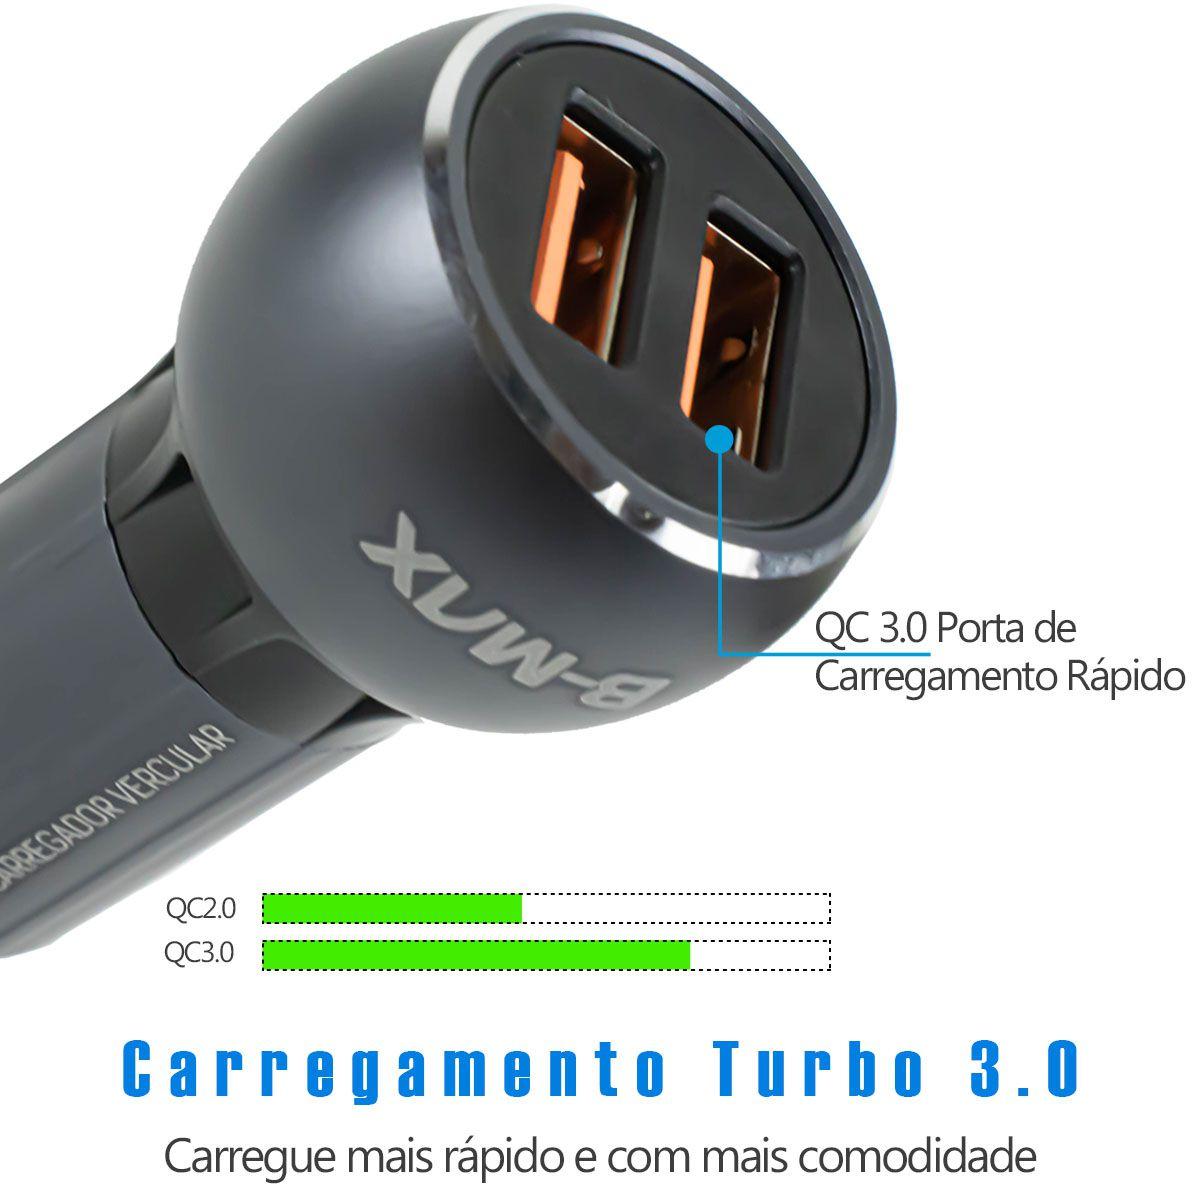 KIT 5x Carregador Veicular Turbo Quick Charge 3.0 36w para Celular Micro Usb V8 B-Max BM8610